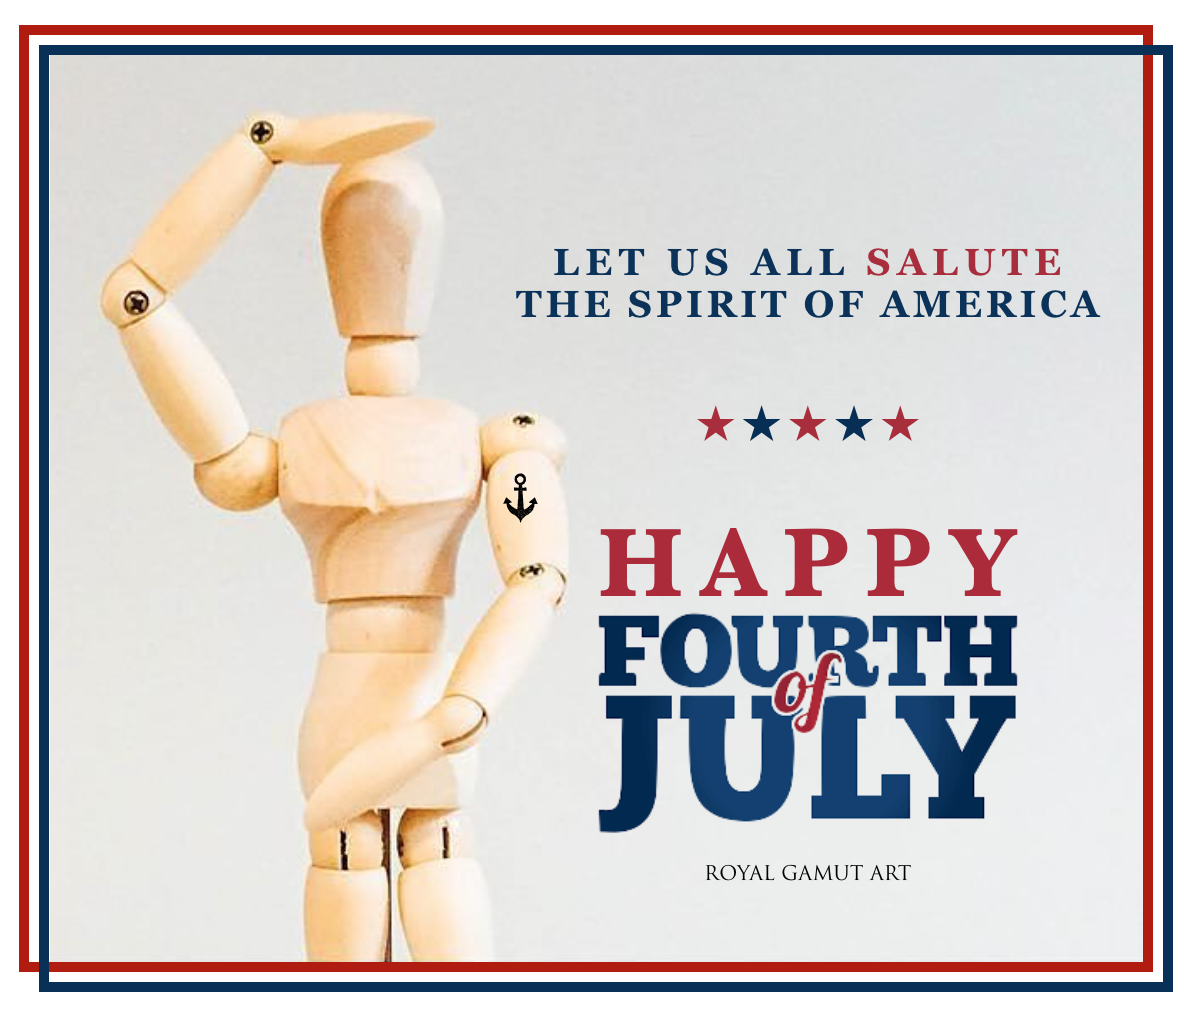 Fourth of July promo Royal Gamut Art